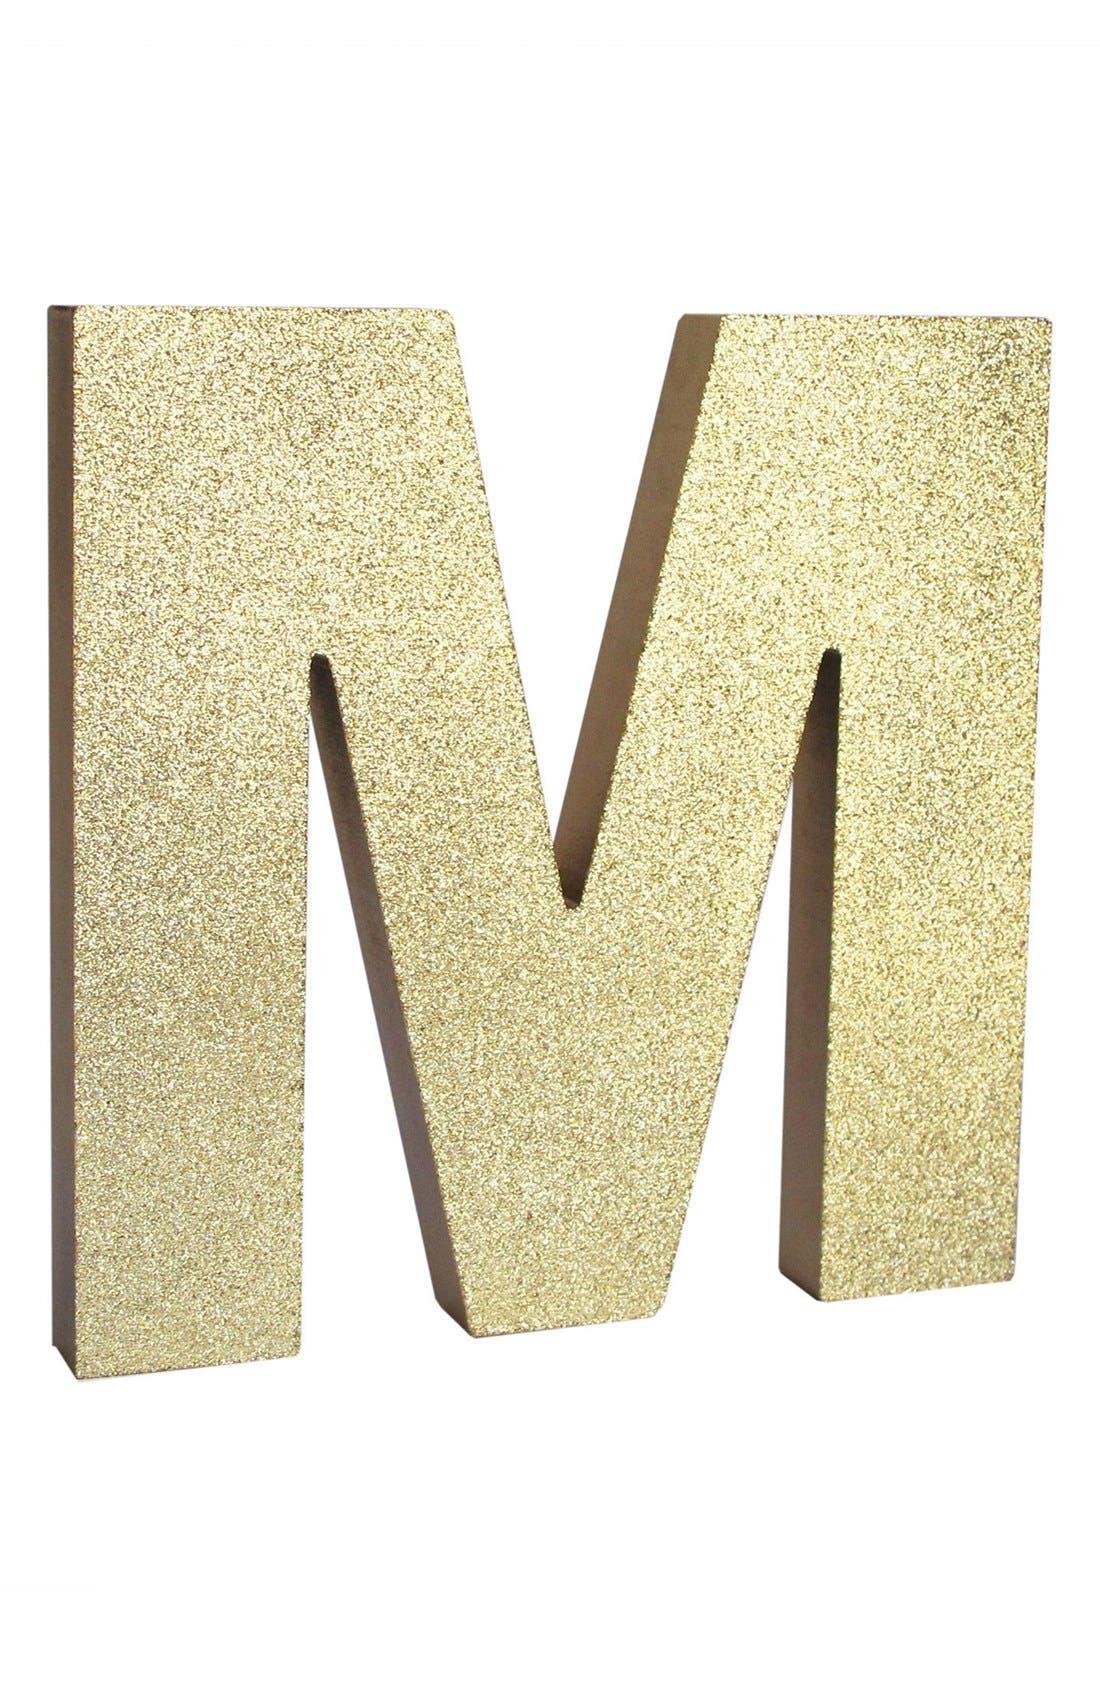 Main Image - American Atelier Glitter Monogram Letter Decoration